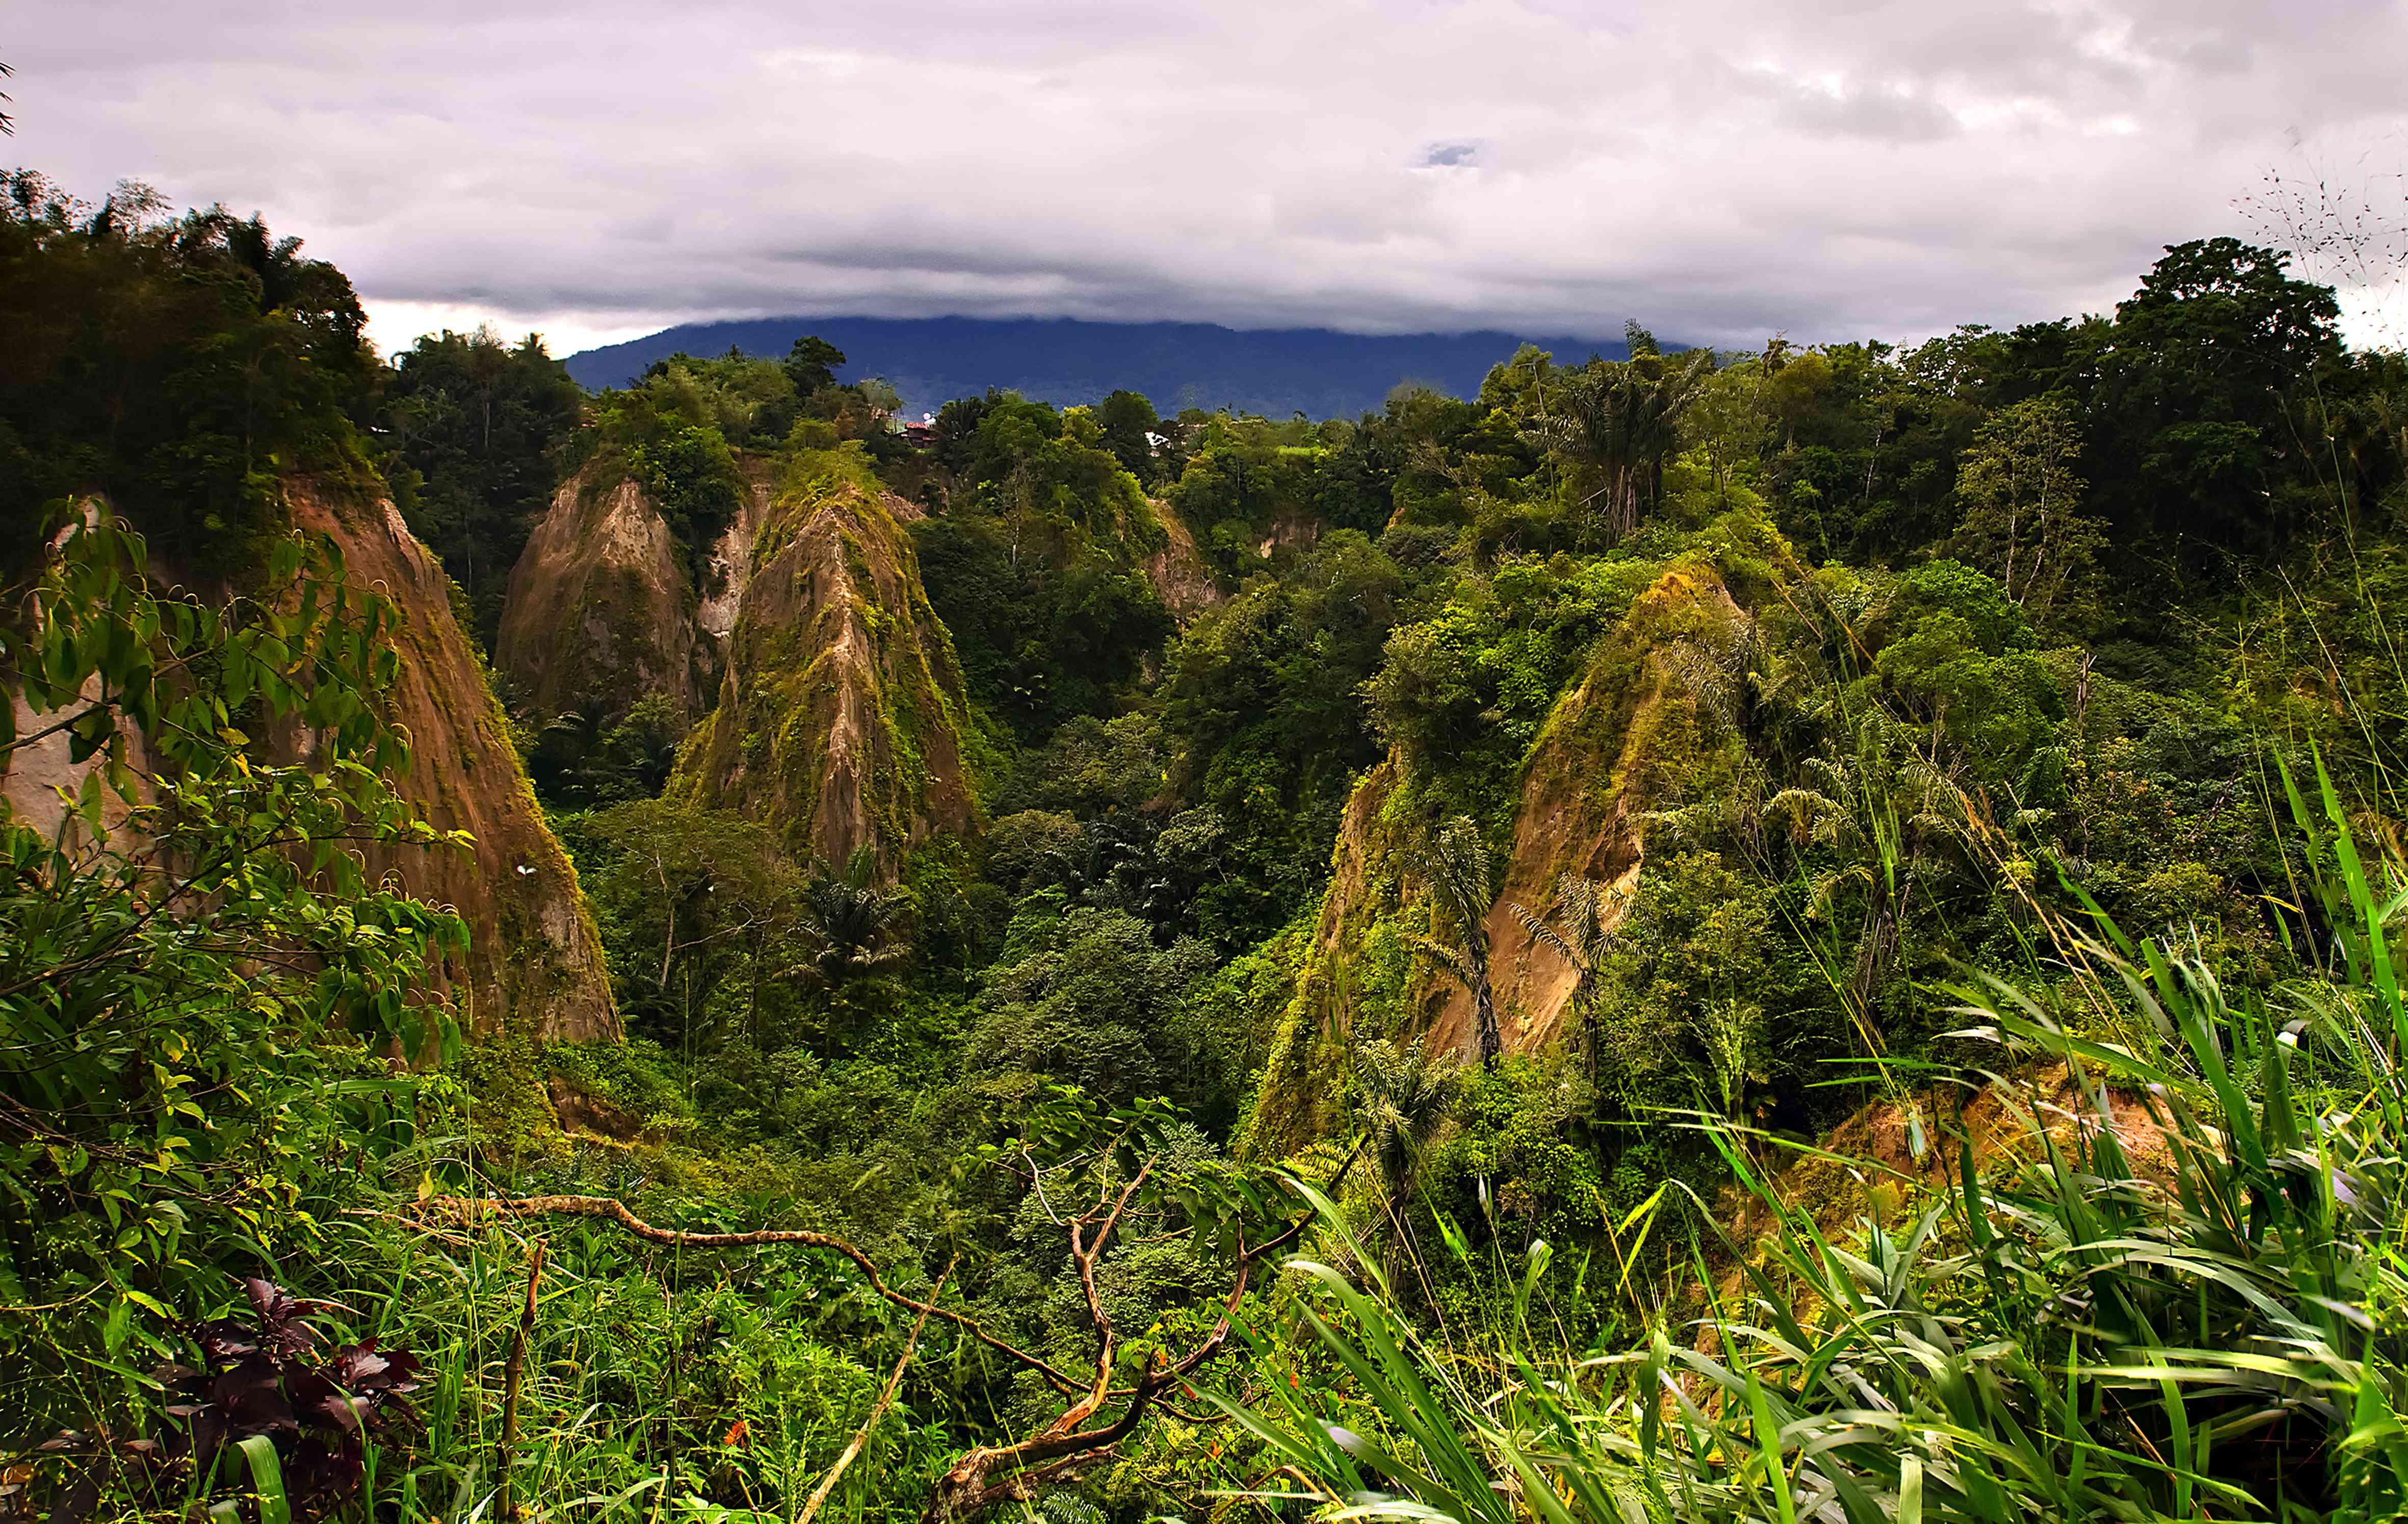 Sianok Canyon near Bukittinggi in West Sumatra